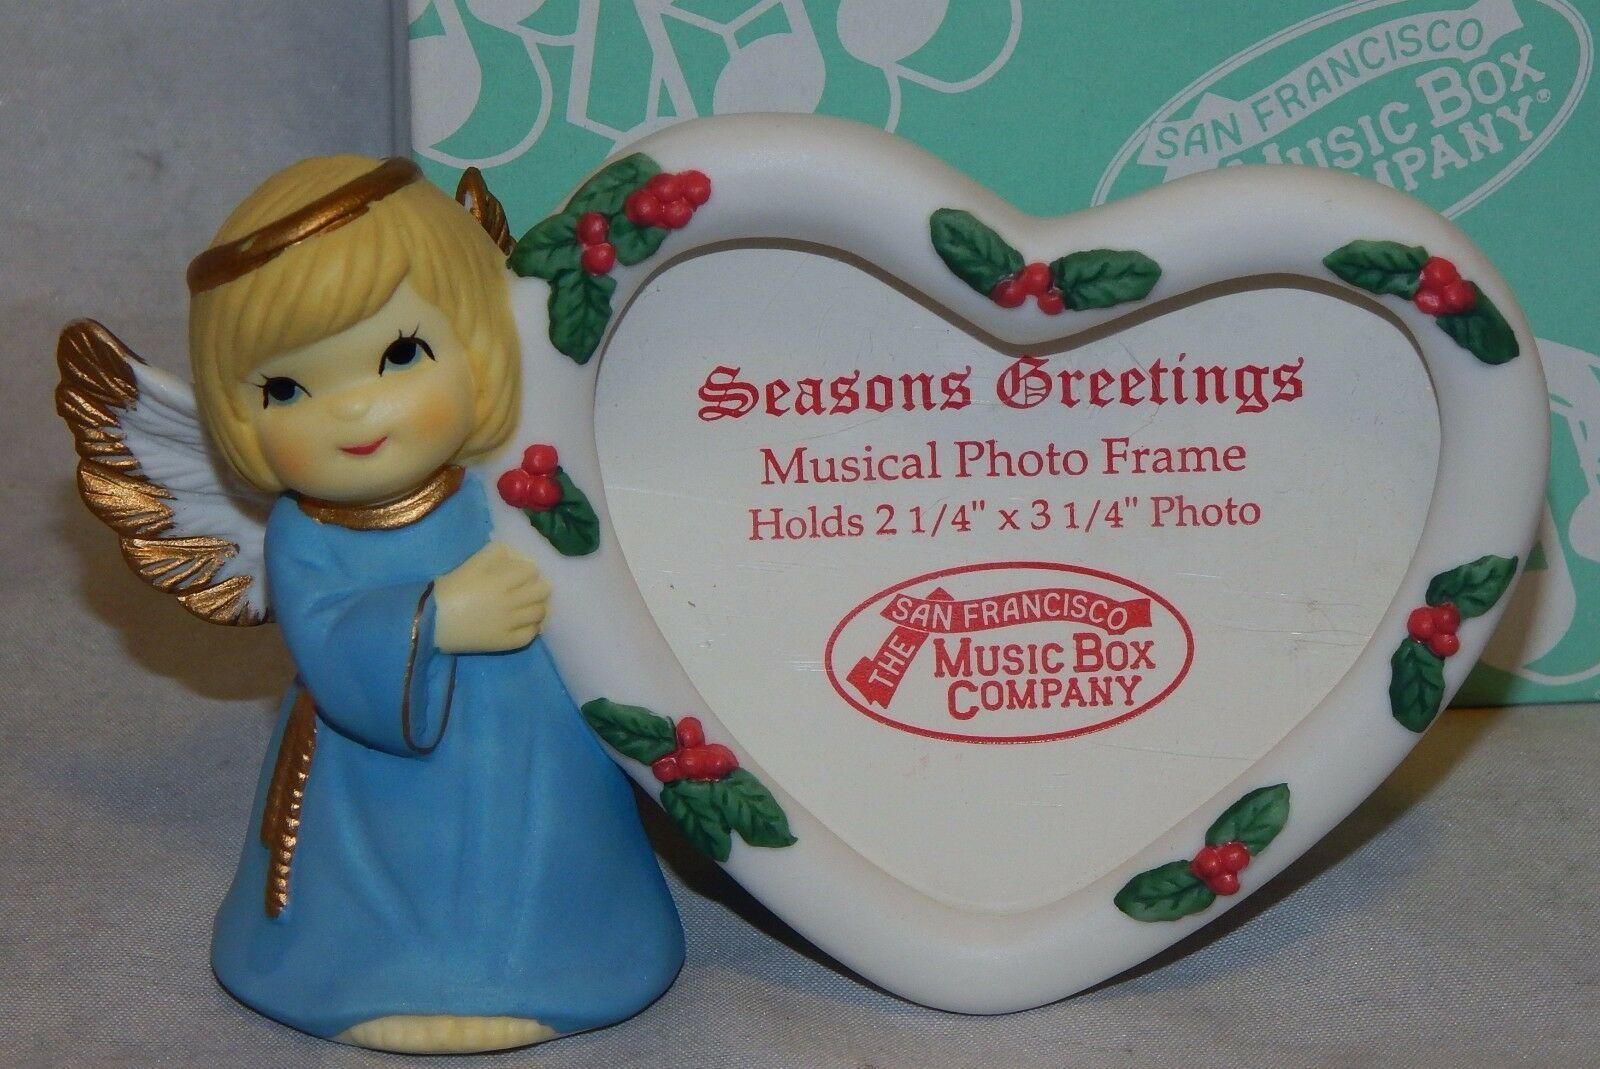 San Francisco Music Box Company Season's Greetings Musical Photo Frame